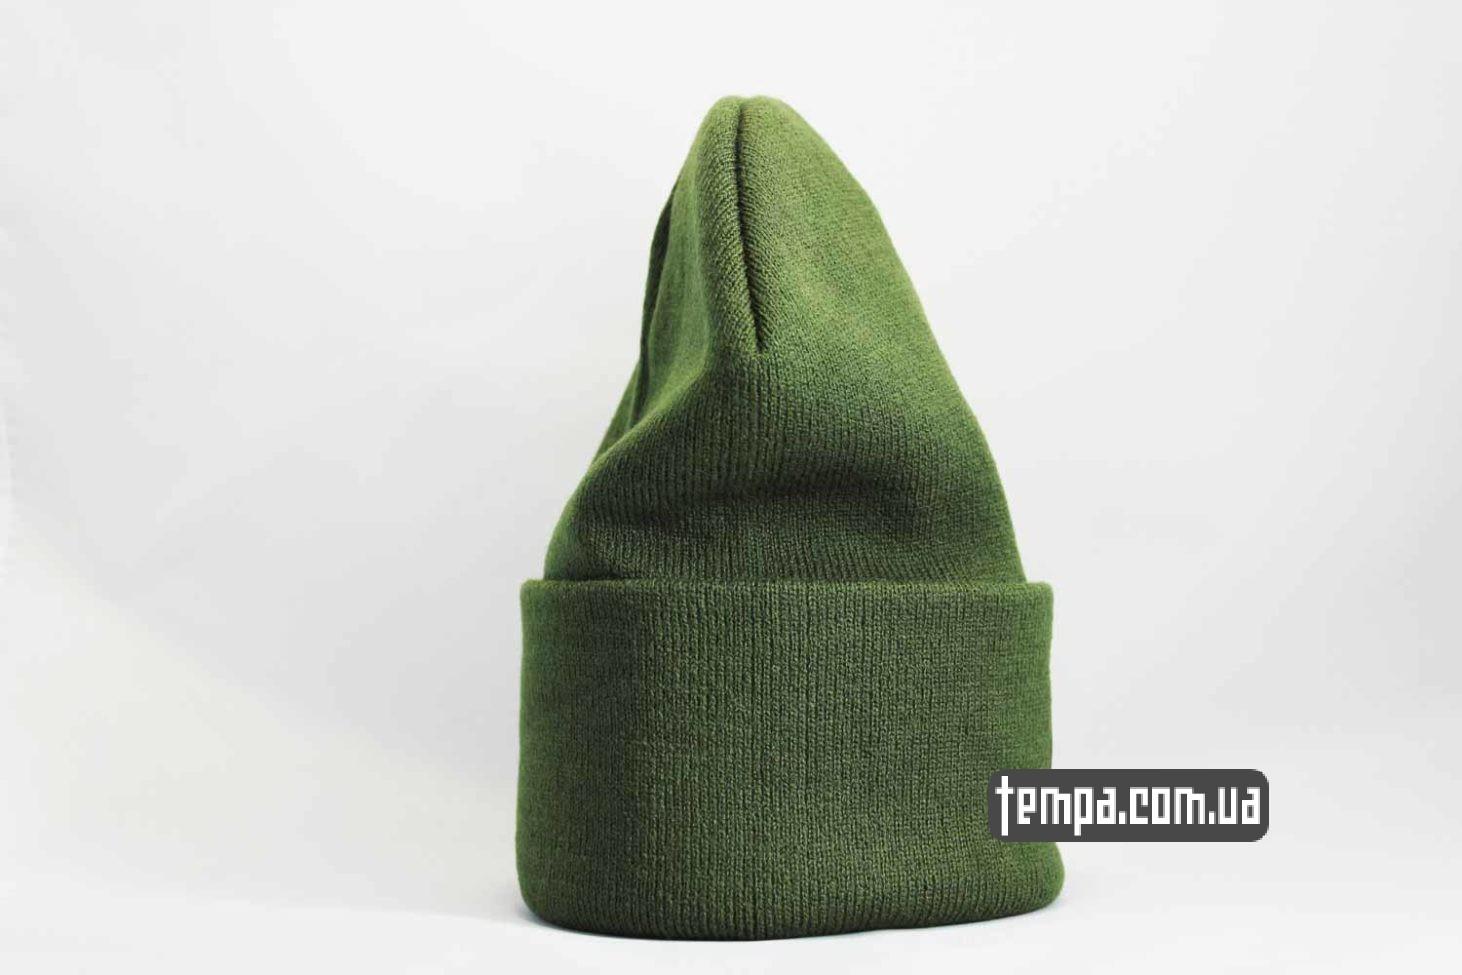 leather carhartt шапка beanie Carhartt кожаная зеленая с логотипом